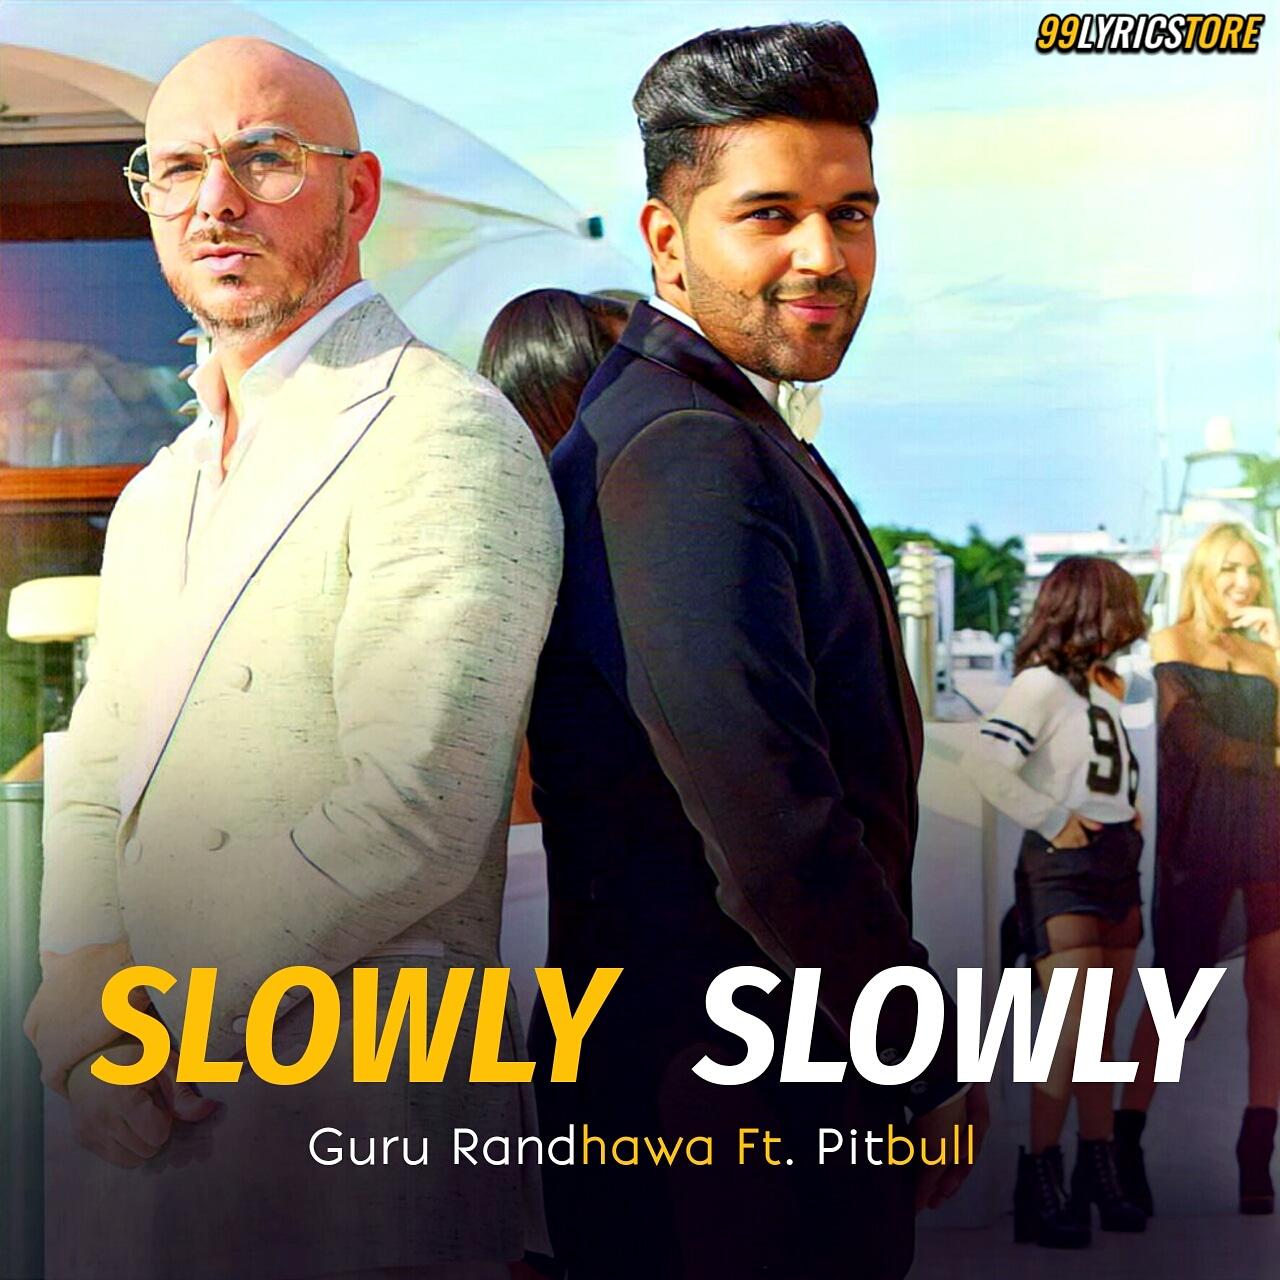 Slowly Slowly Lyrics sung by Guru Randhawa and Pitbull